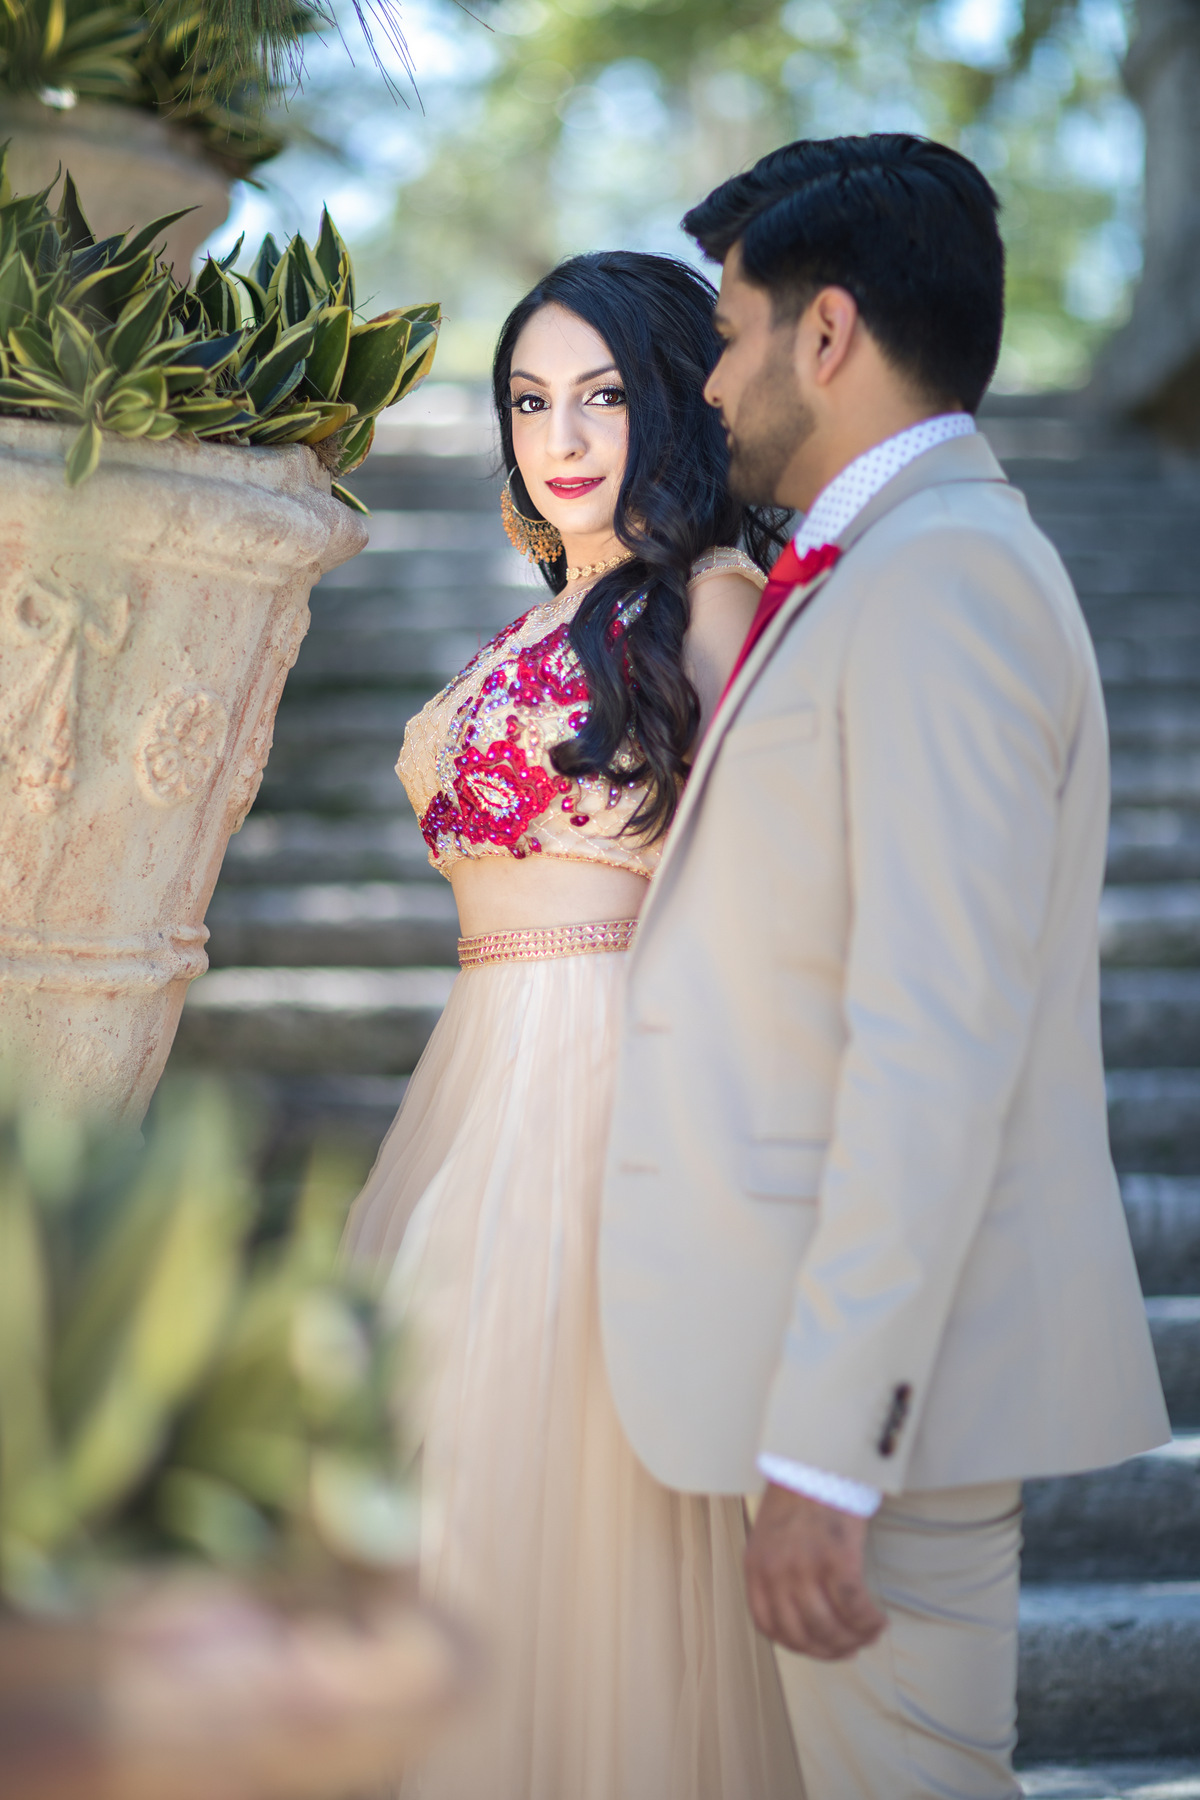 Richa + Shashank | Indian Engagement photos in Miami,  Vizcaya Museum and Gardens, Miami Wedding Photographers | Häring Photography, Indian Wedding Photographer in Florida, Best Muslim, Hindu - South East Asian Wedding Photographers